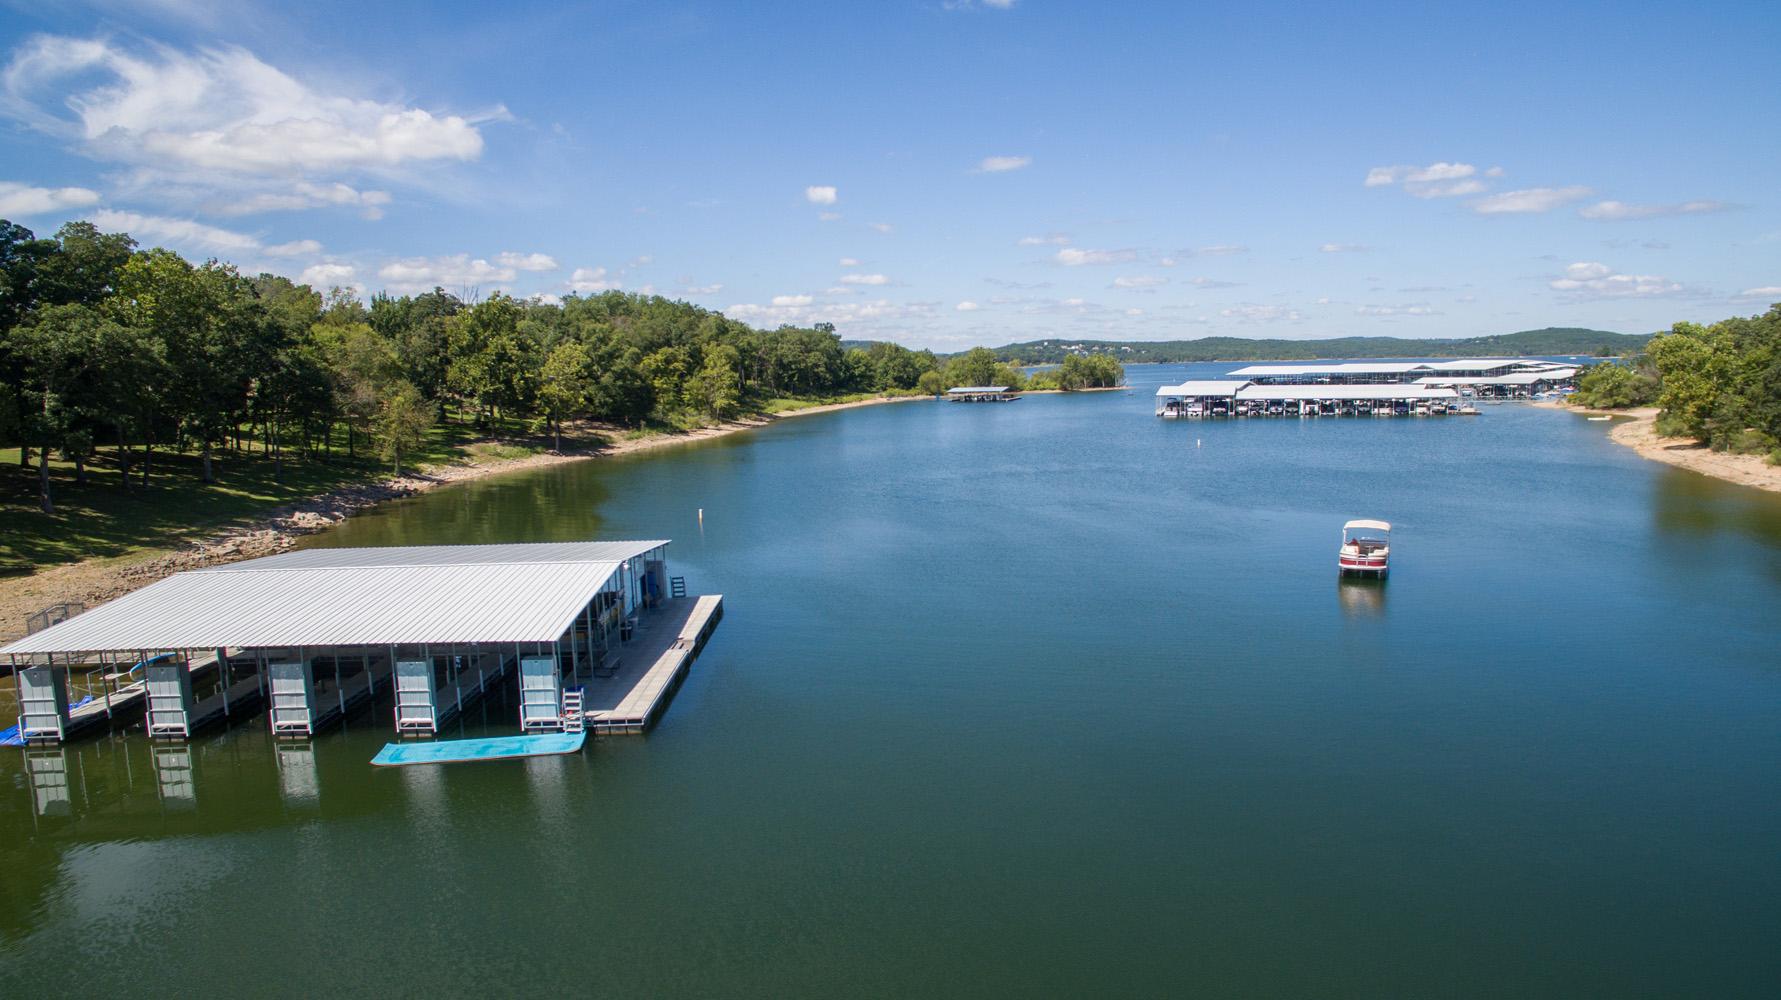 Aerial shot of lake, boat, and docks